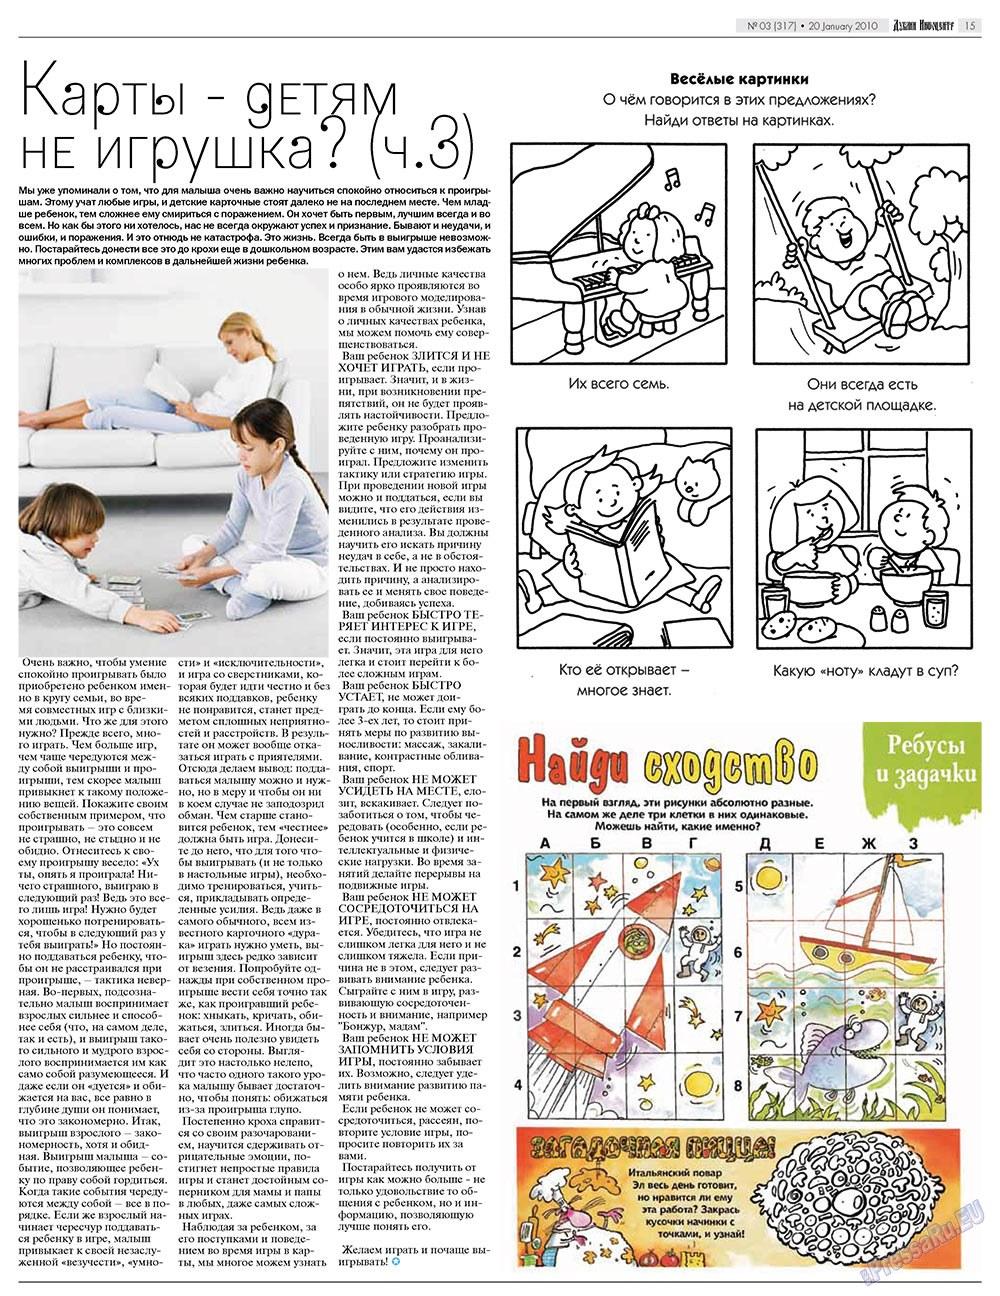 Дублин инфоцентр (газета). 2010 год, номер 3, стр. 15